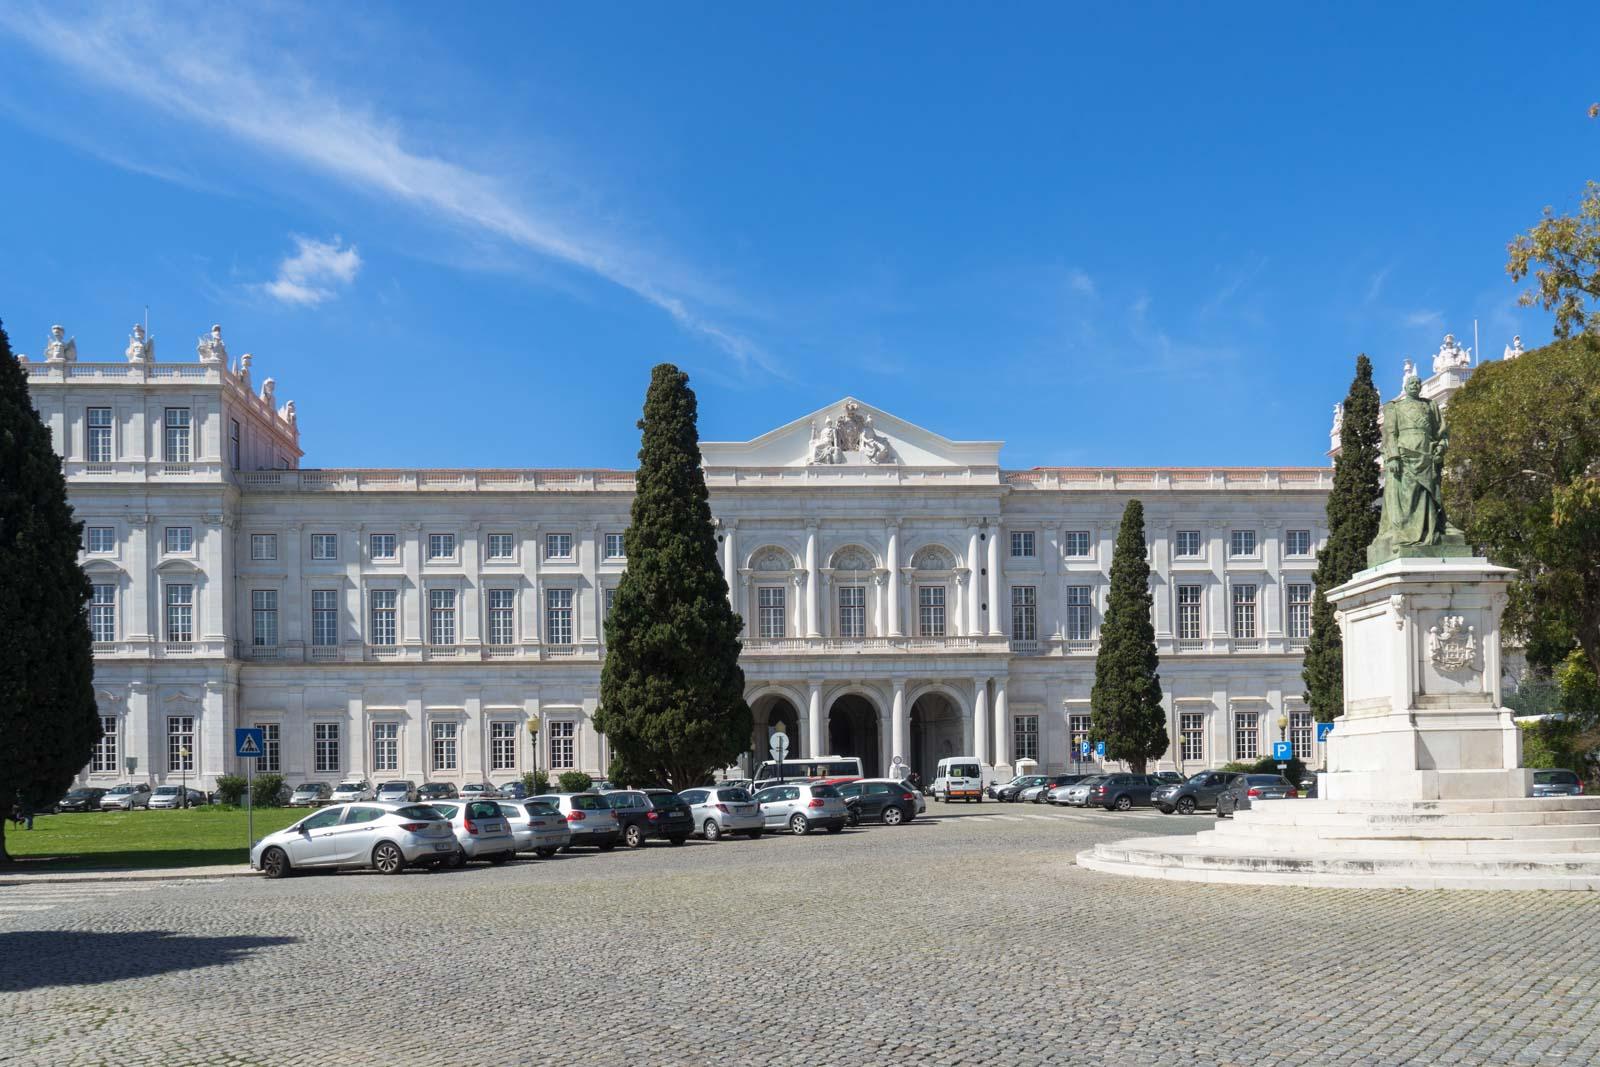 Ajuda Palace, Belem, Lisbon, Portugal